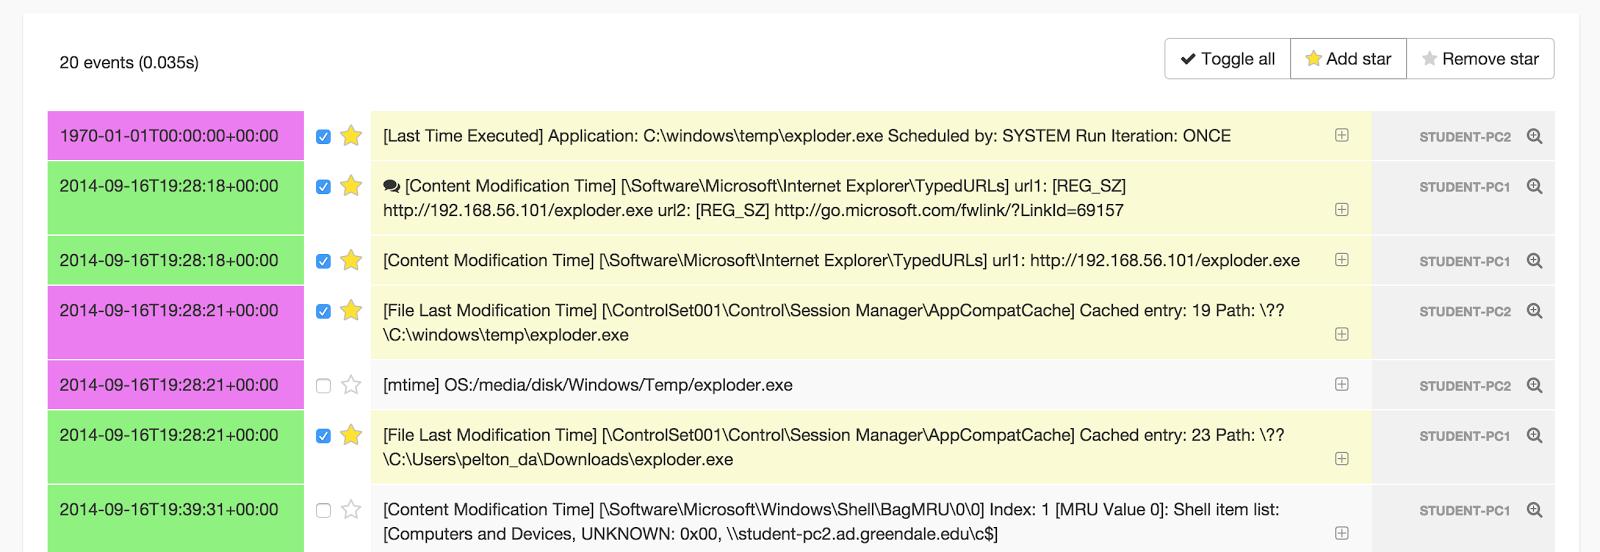 distributedcom 10016 windows 10